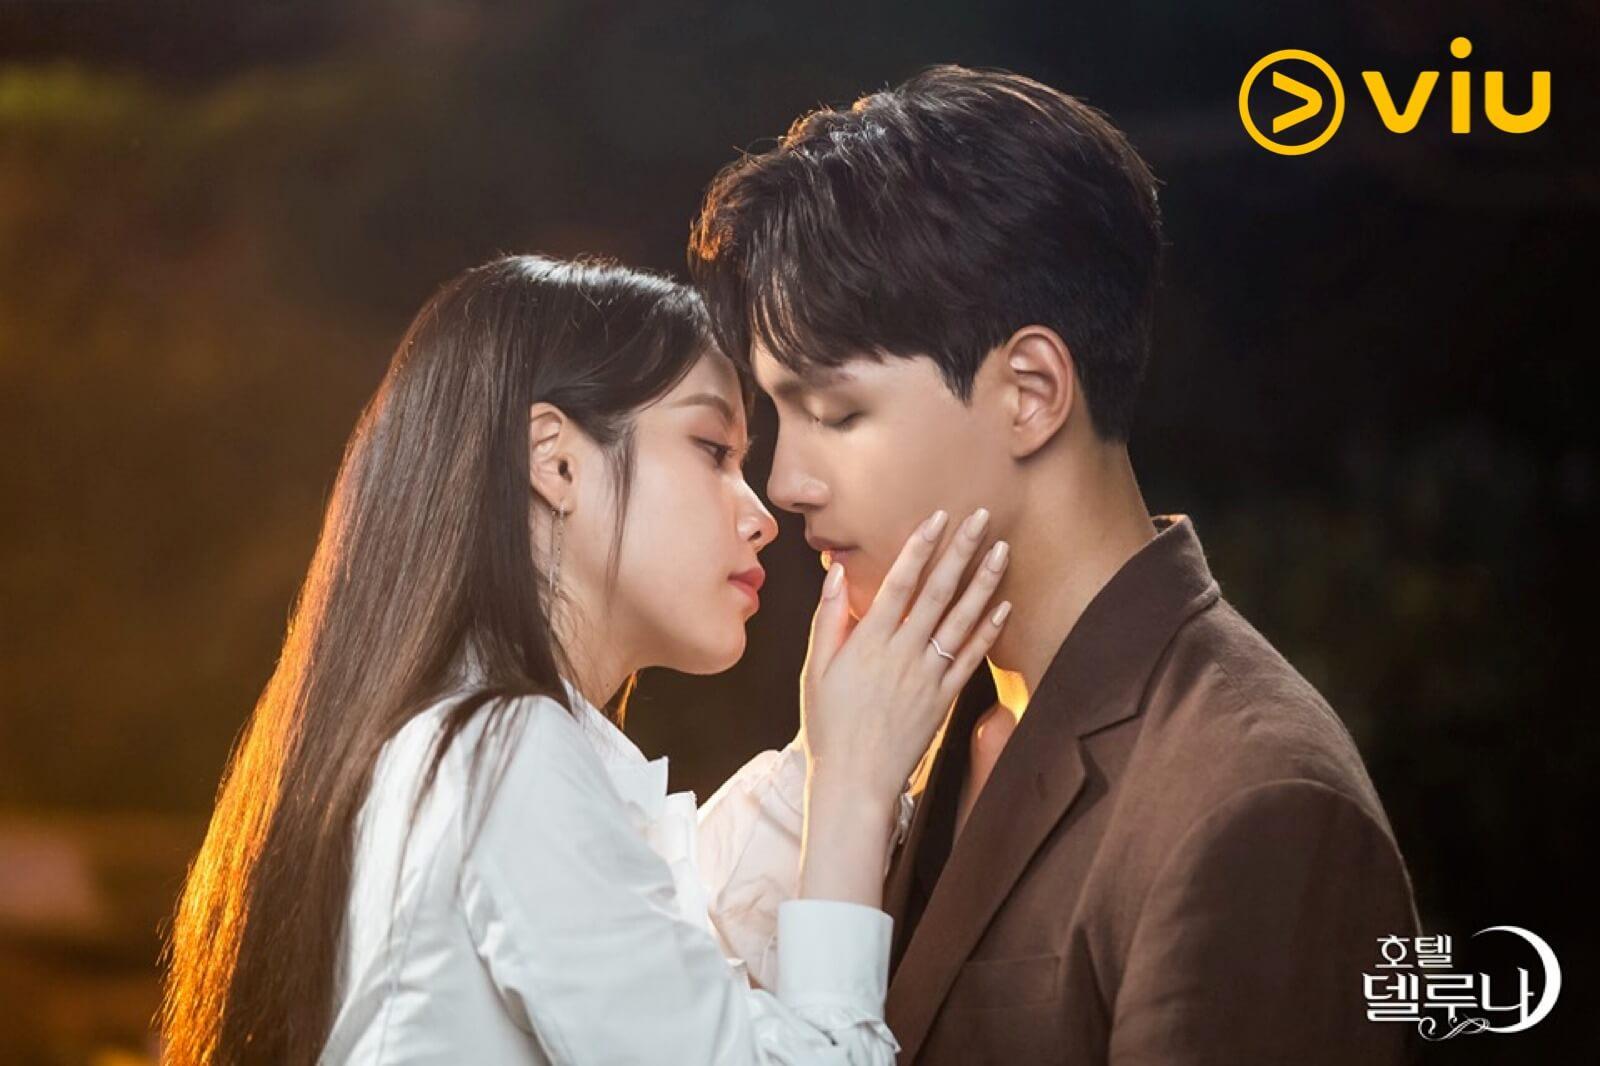 20190828-korea9-2